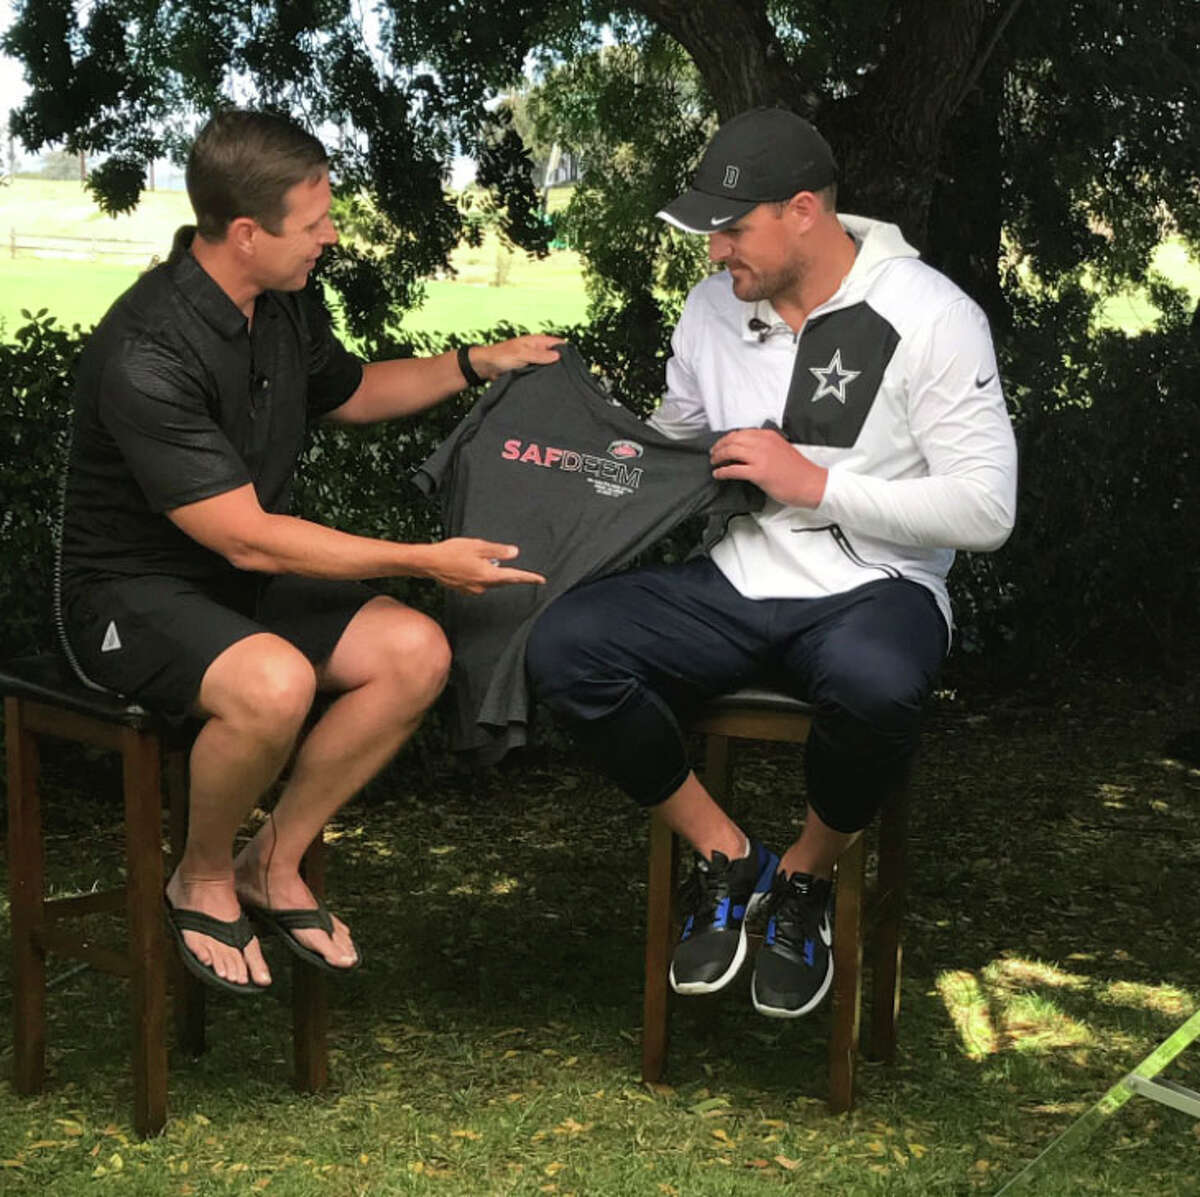 ESPN SA presents Dallas Cowboys' tight end, Jason Witten, with tribute shirt for fallen firefighter, Scott Deem.